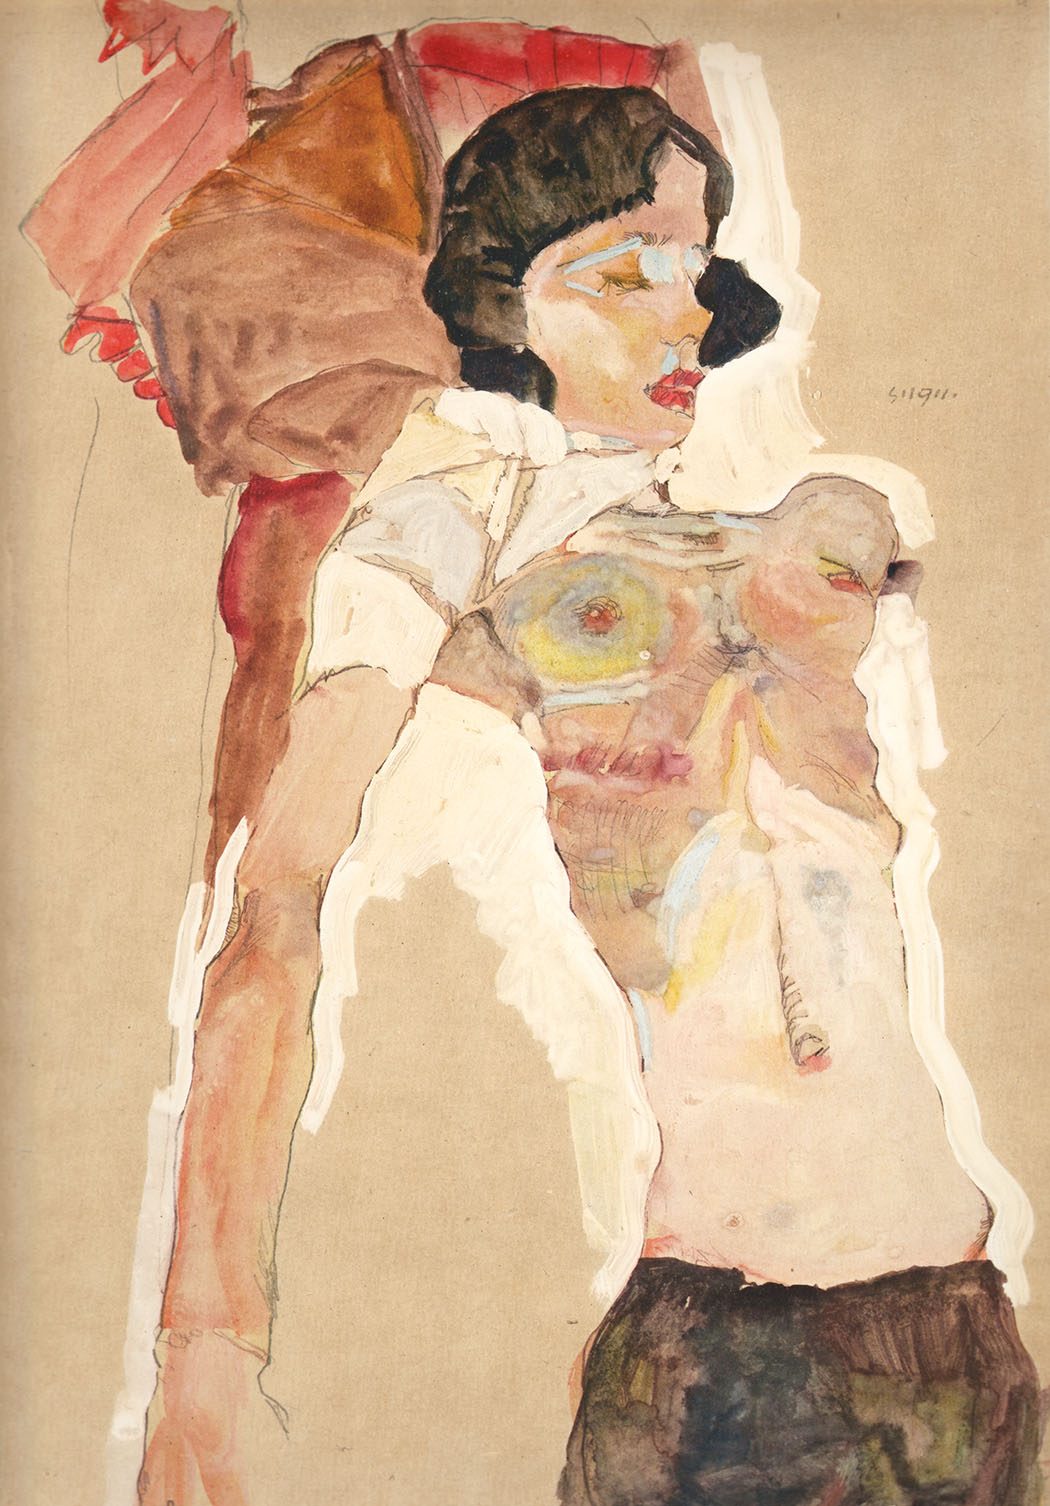 Schiele 16, Lithograph, Girl Reclining, 1968